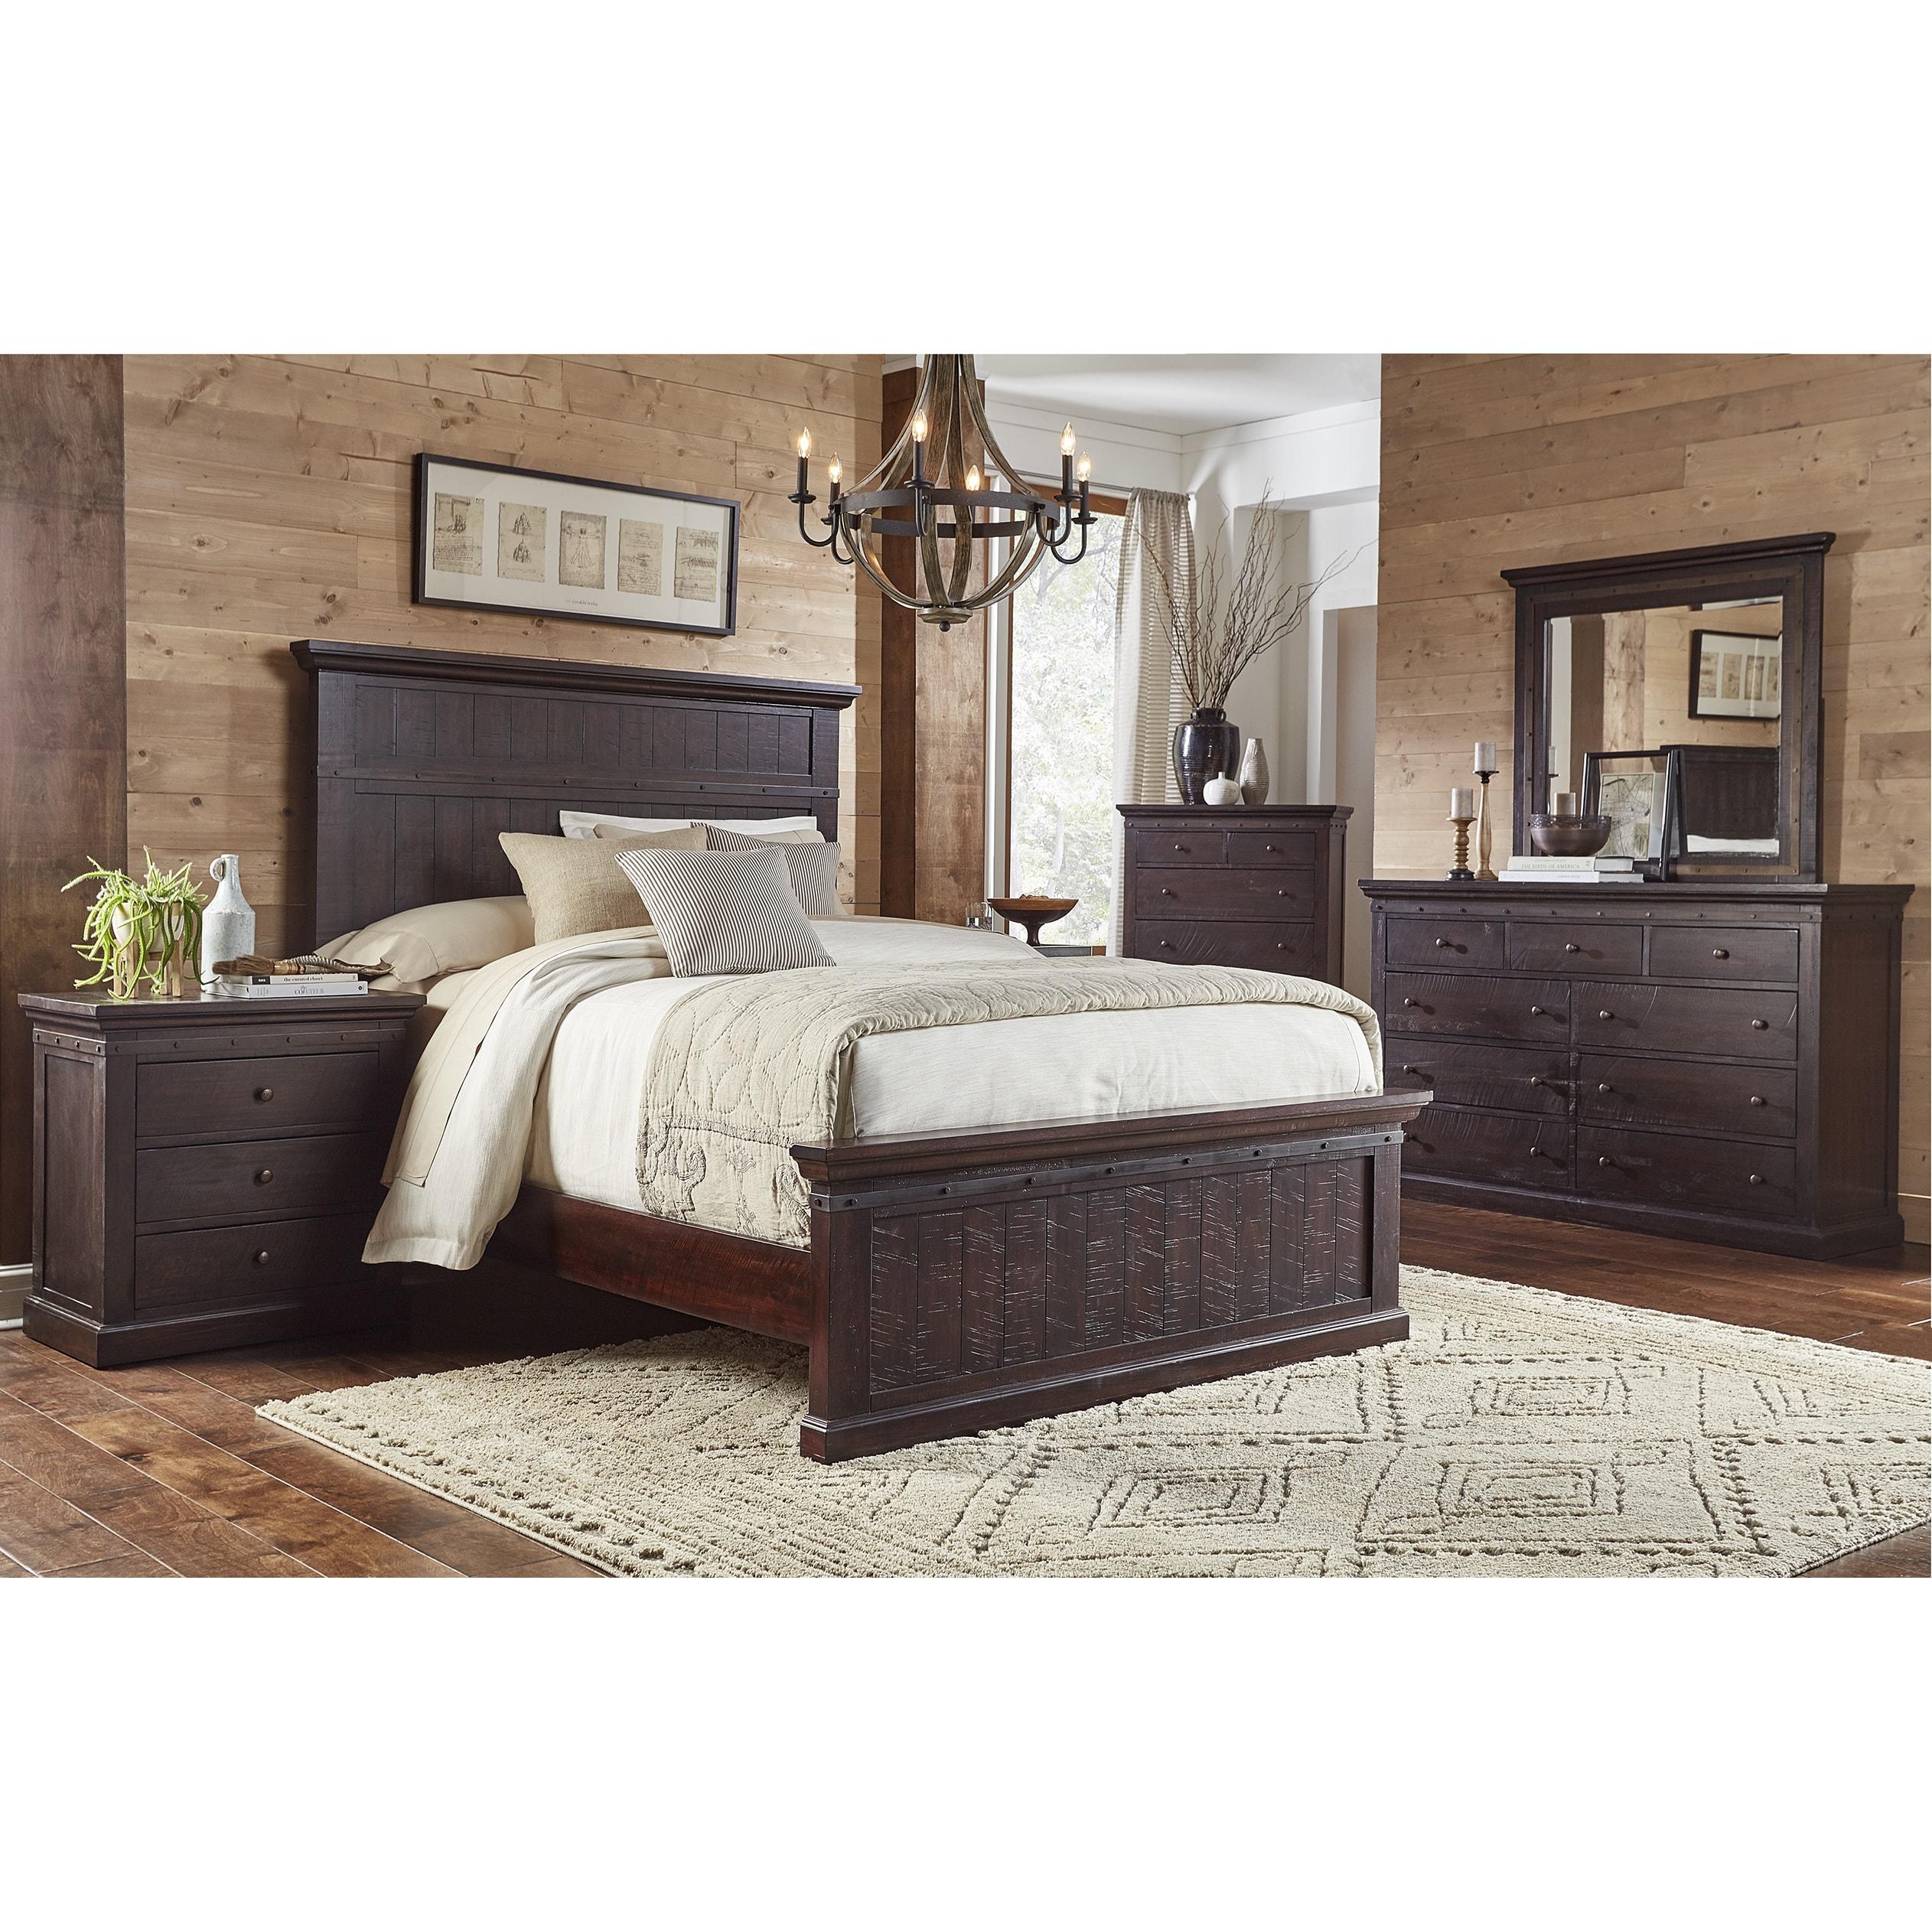 Lara 6pc Solid Wood King Bedroom Set Overstock 16121426